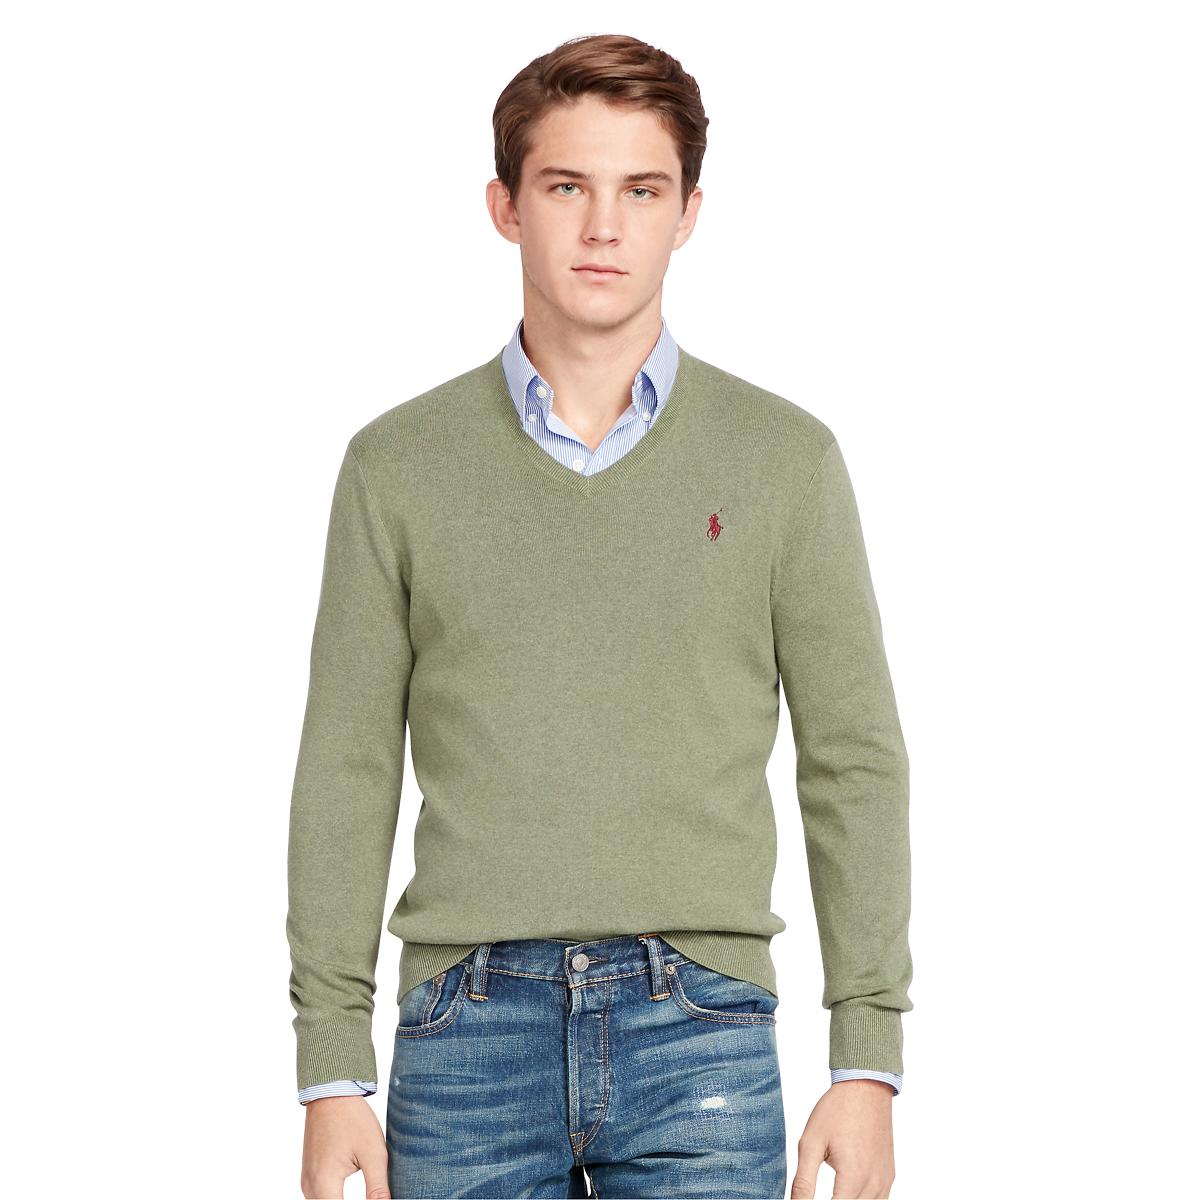 3f465a1c95bc Cotton V-Neck Sweater | V-Neck Sweaters | Ralph Lauren